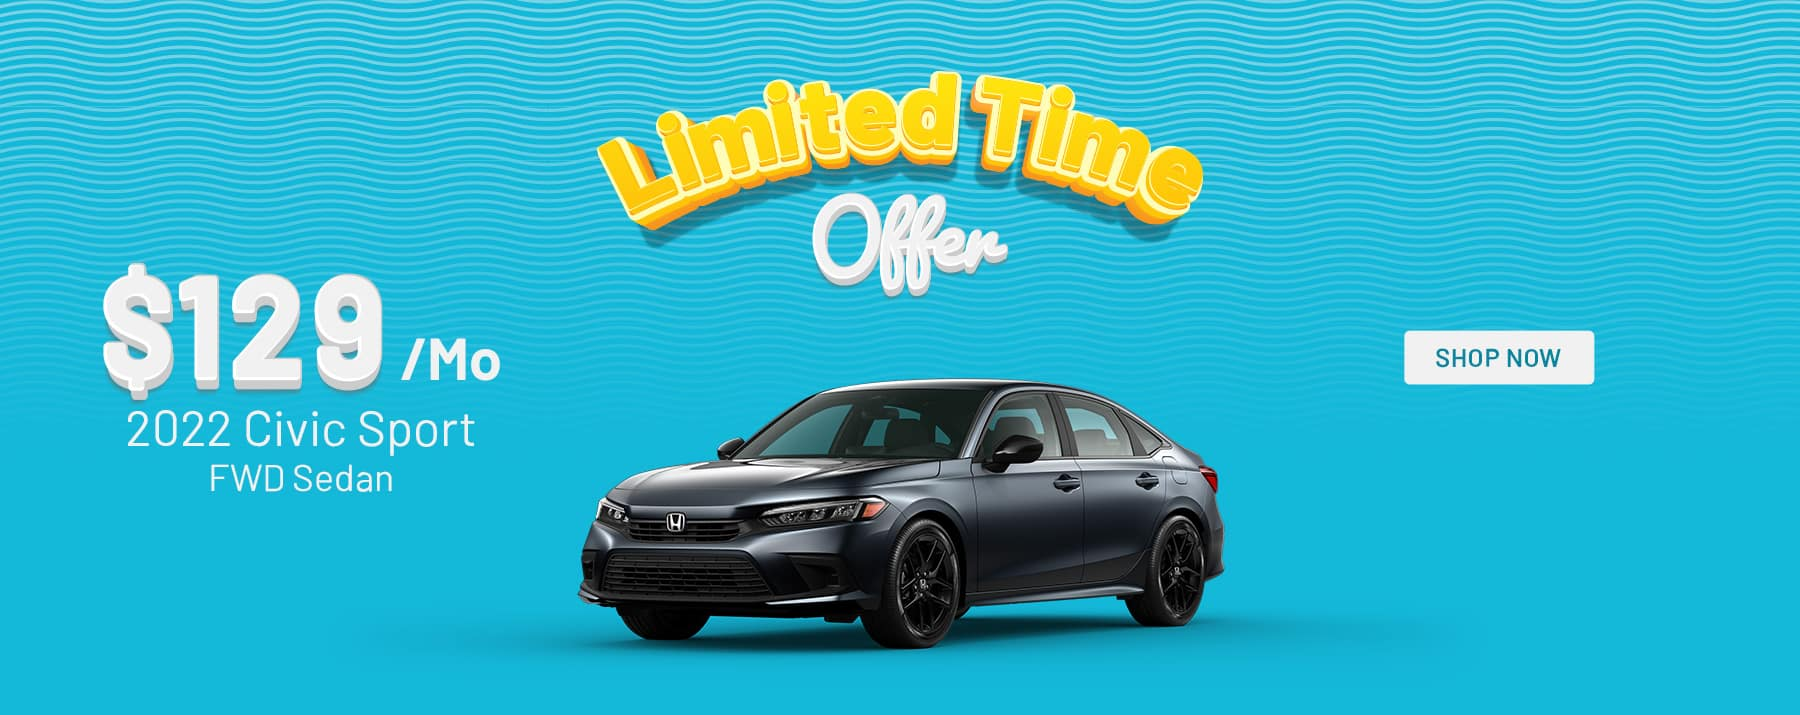 2021 Honda Civic Special